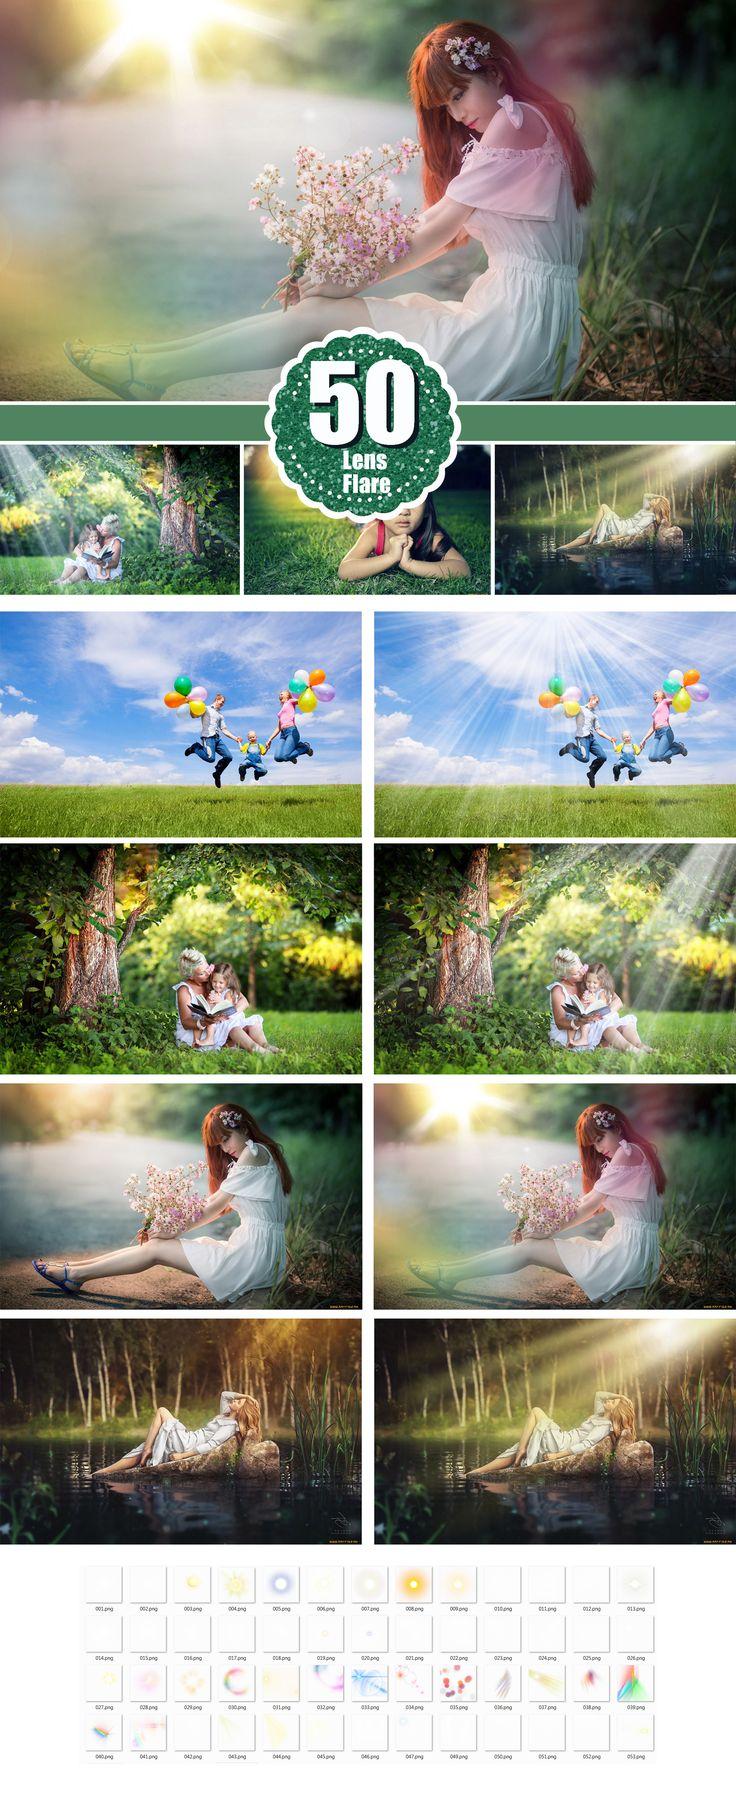 natural sun lens Photo Overlays, Lens Flare, Sun beams streaks, Photography Overlays, Photography Textures, Digital Download,